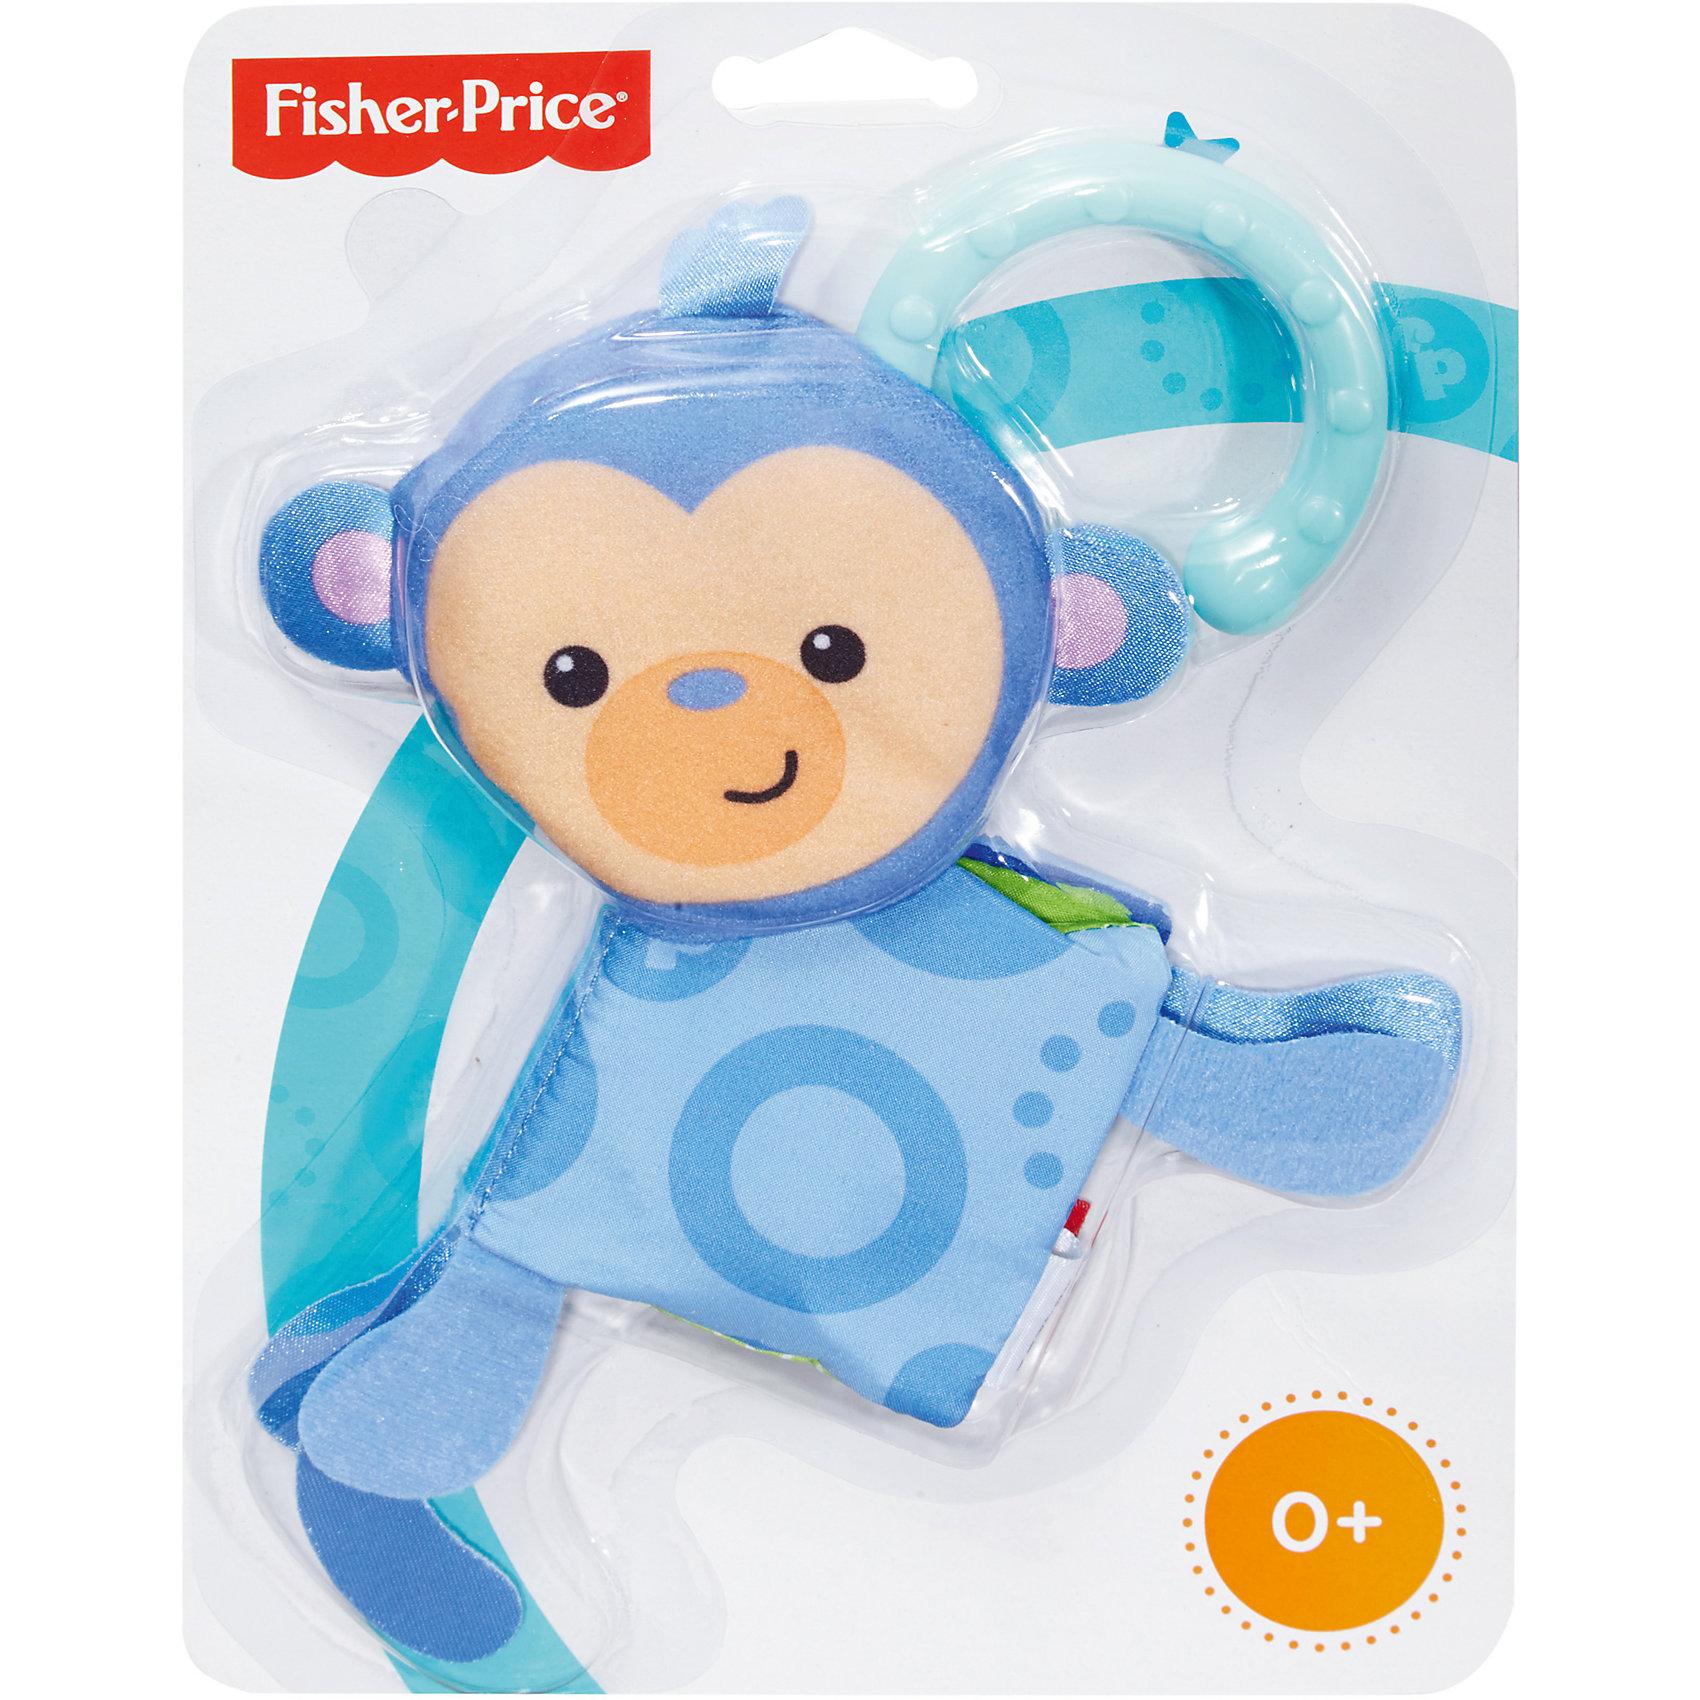 ������ ������, Fisher-Price (Mattel)